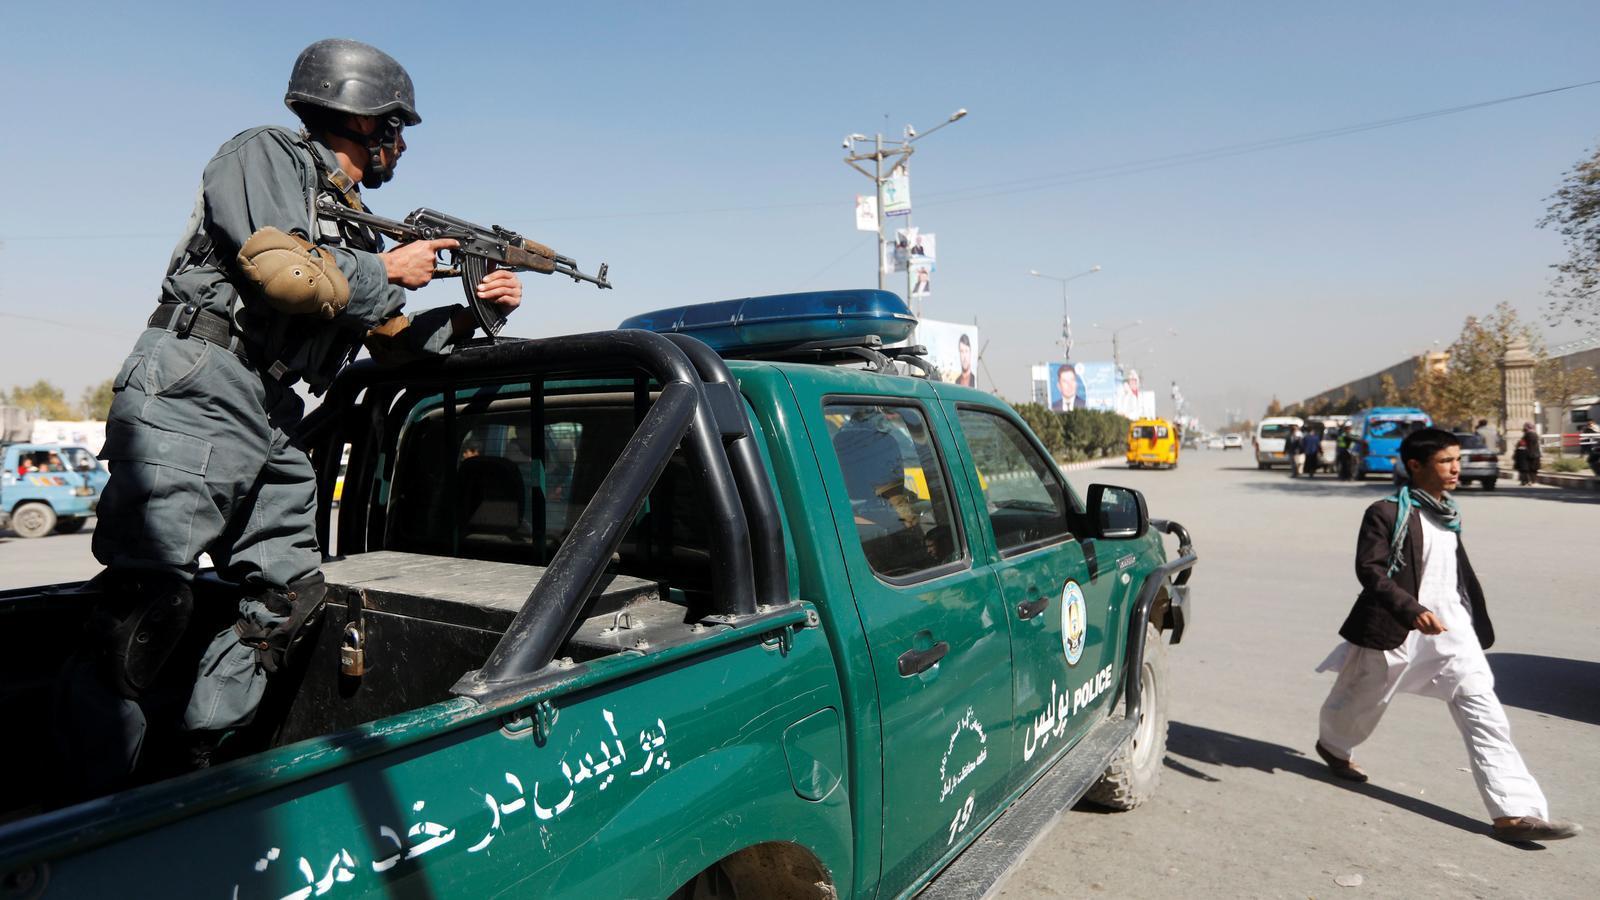 Un policia fa guàrdia en un control de vigilància a Kabul.